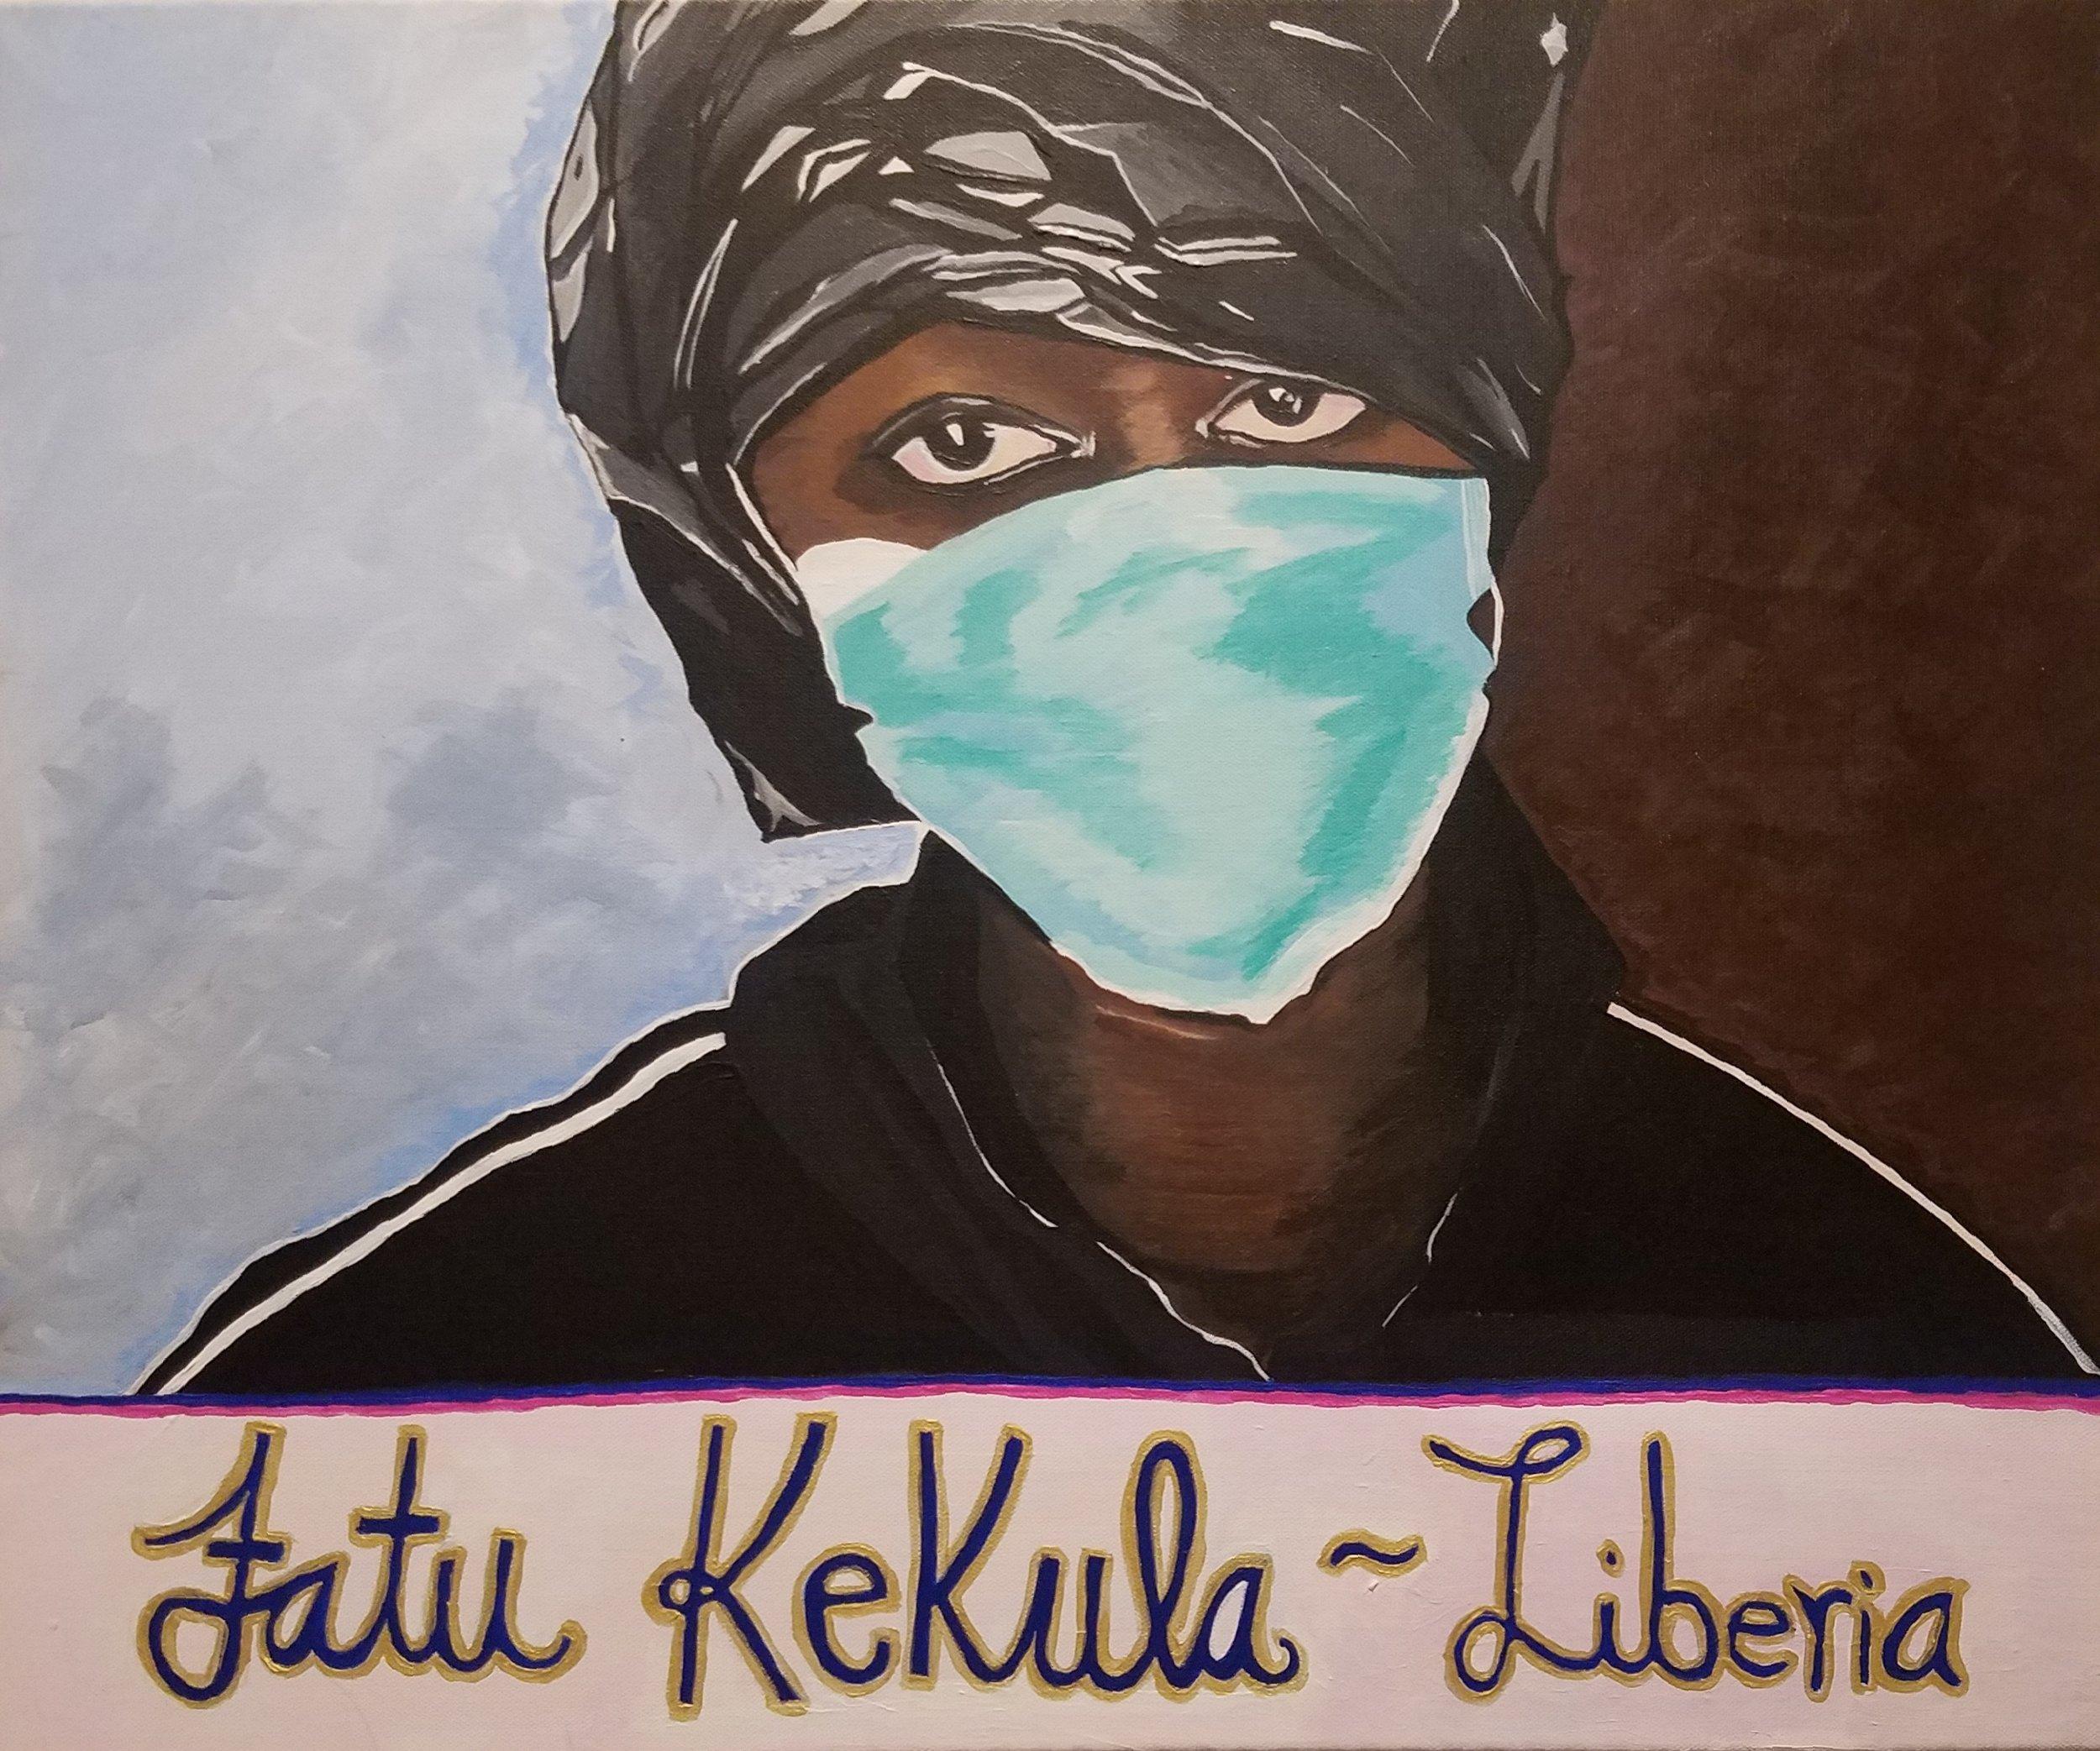 Fatu Kekula: Liberia  by Adriana Garriga-Lopez.  Fall 2017 Intima